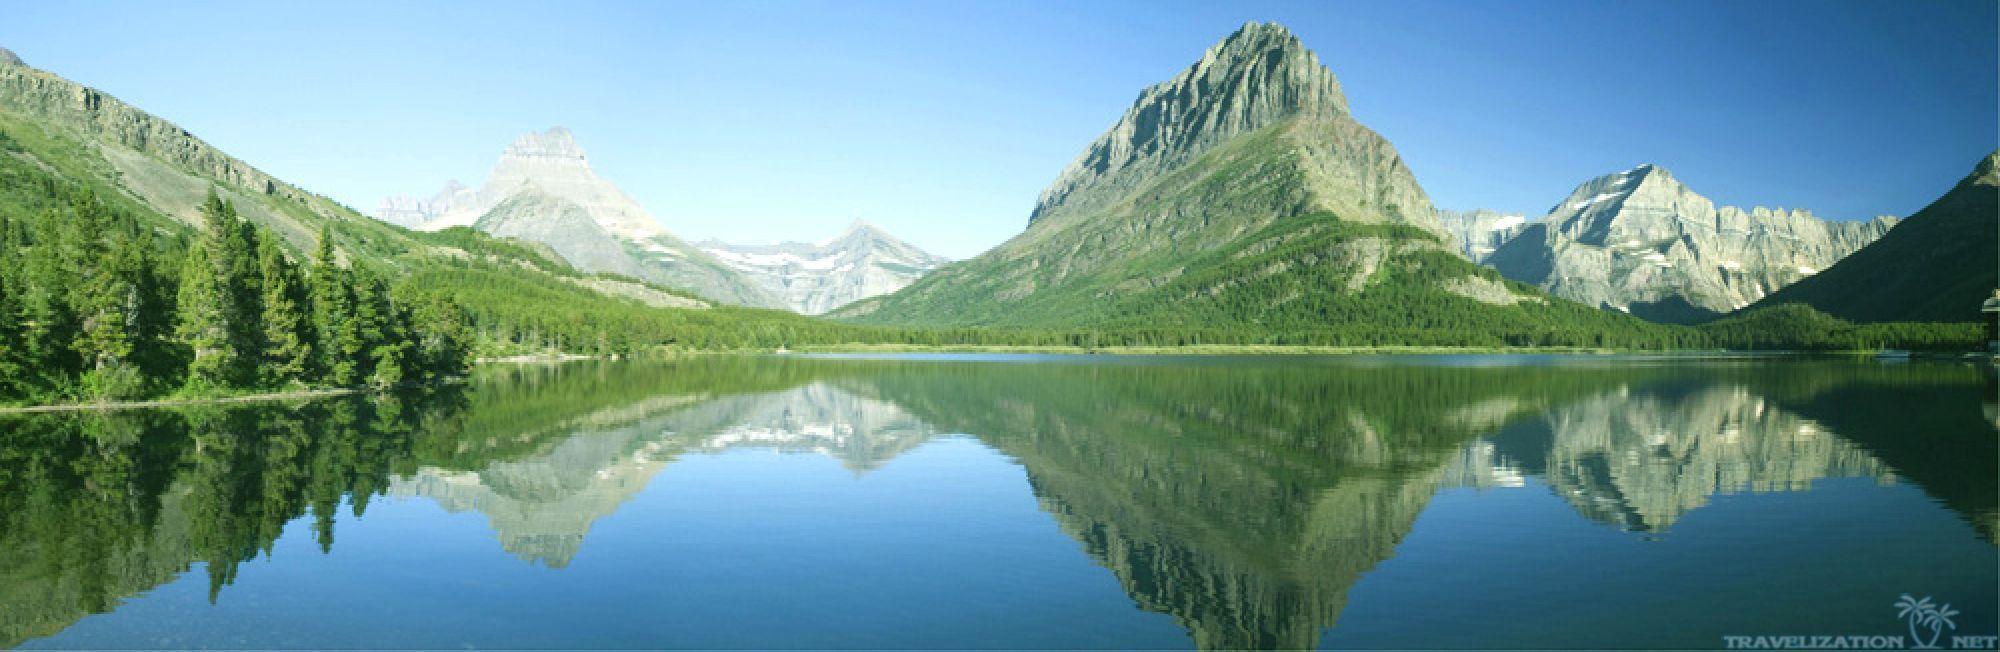 K Ultra Hd Panorama Wallpapers Hd Desktop Backgrounds Swiftcurrent Lake 2000x652 Wallpaper Teahub Io